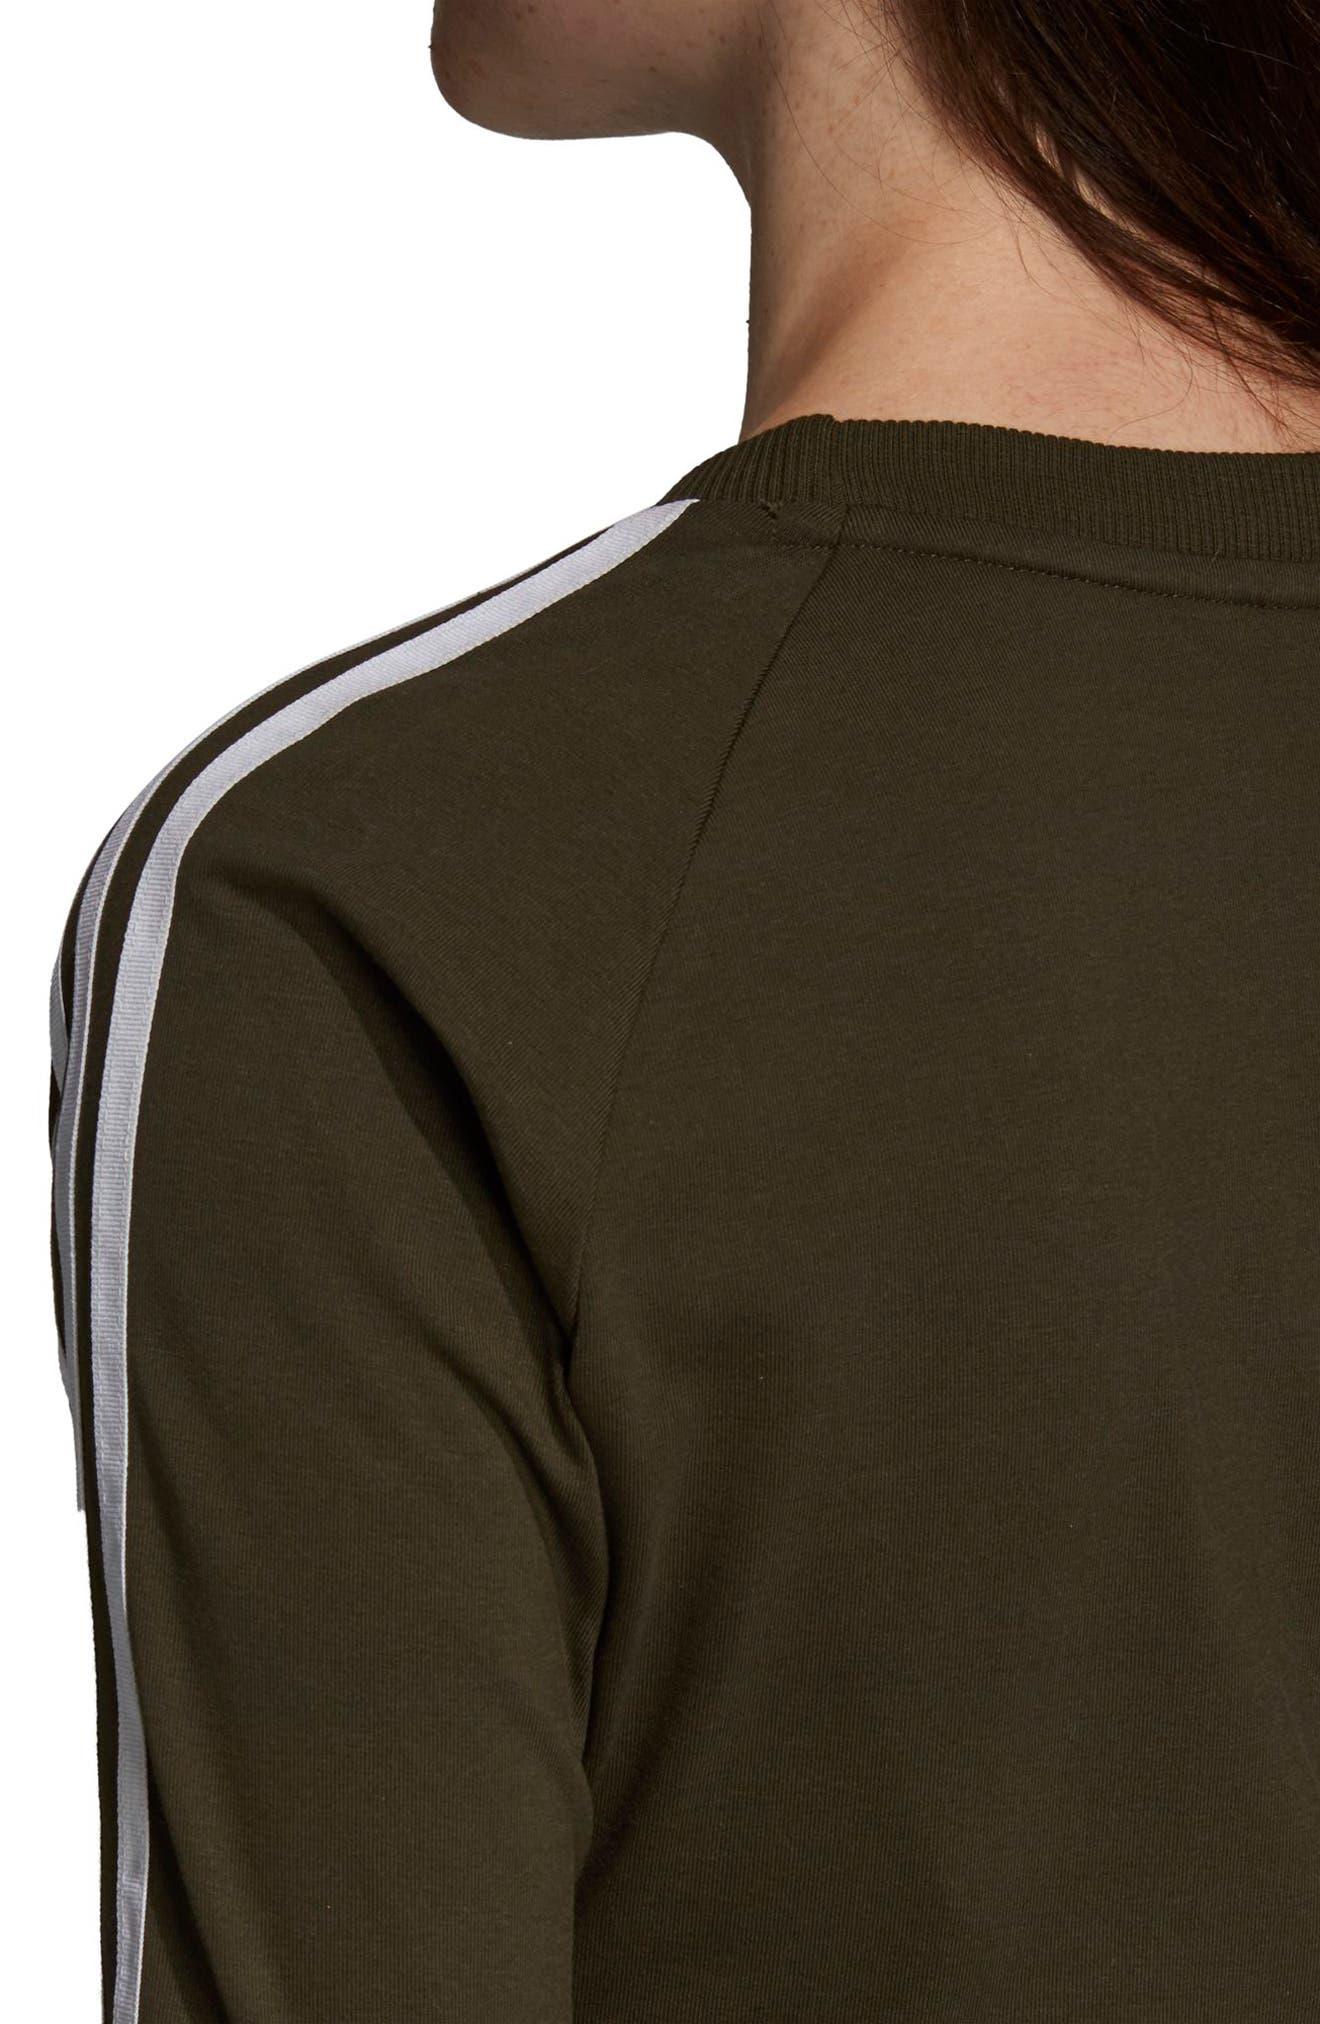 adidas 3-Stripes Dress,                             Alternate thumbnail 7, color,                             NIGHT CARGO